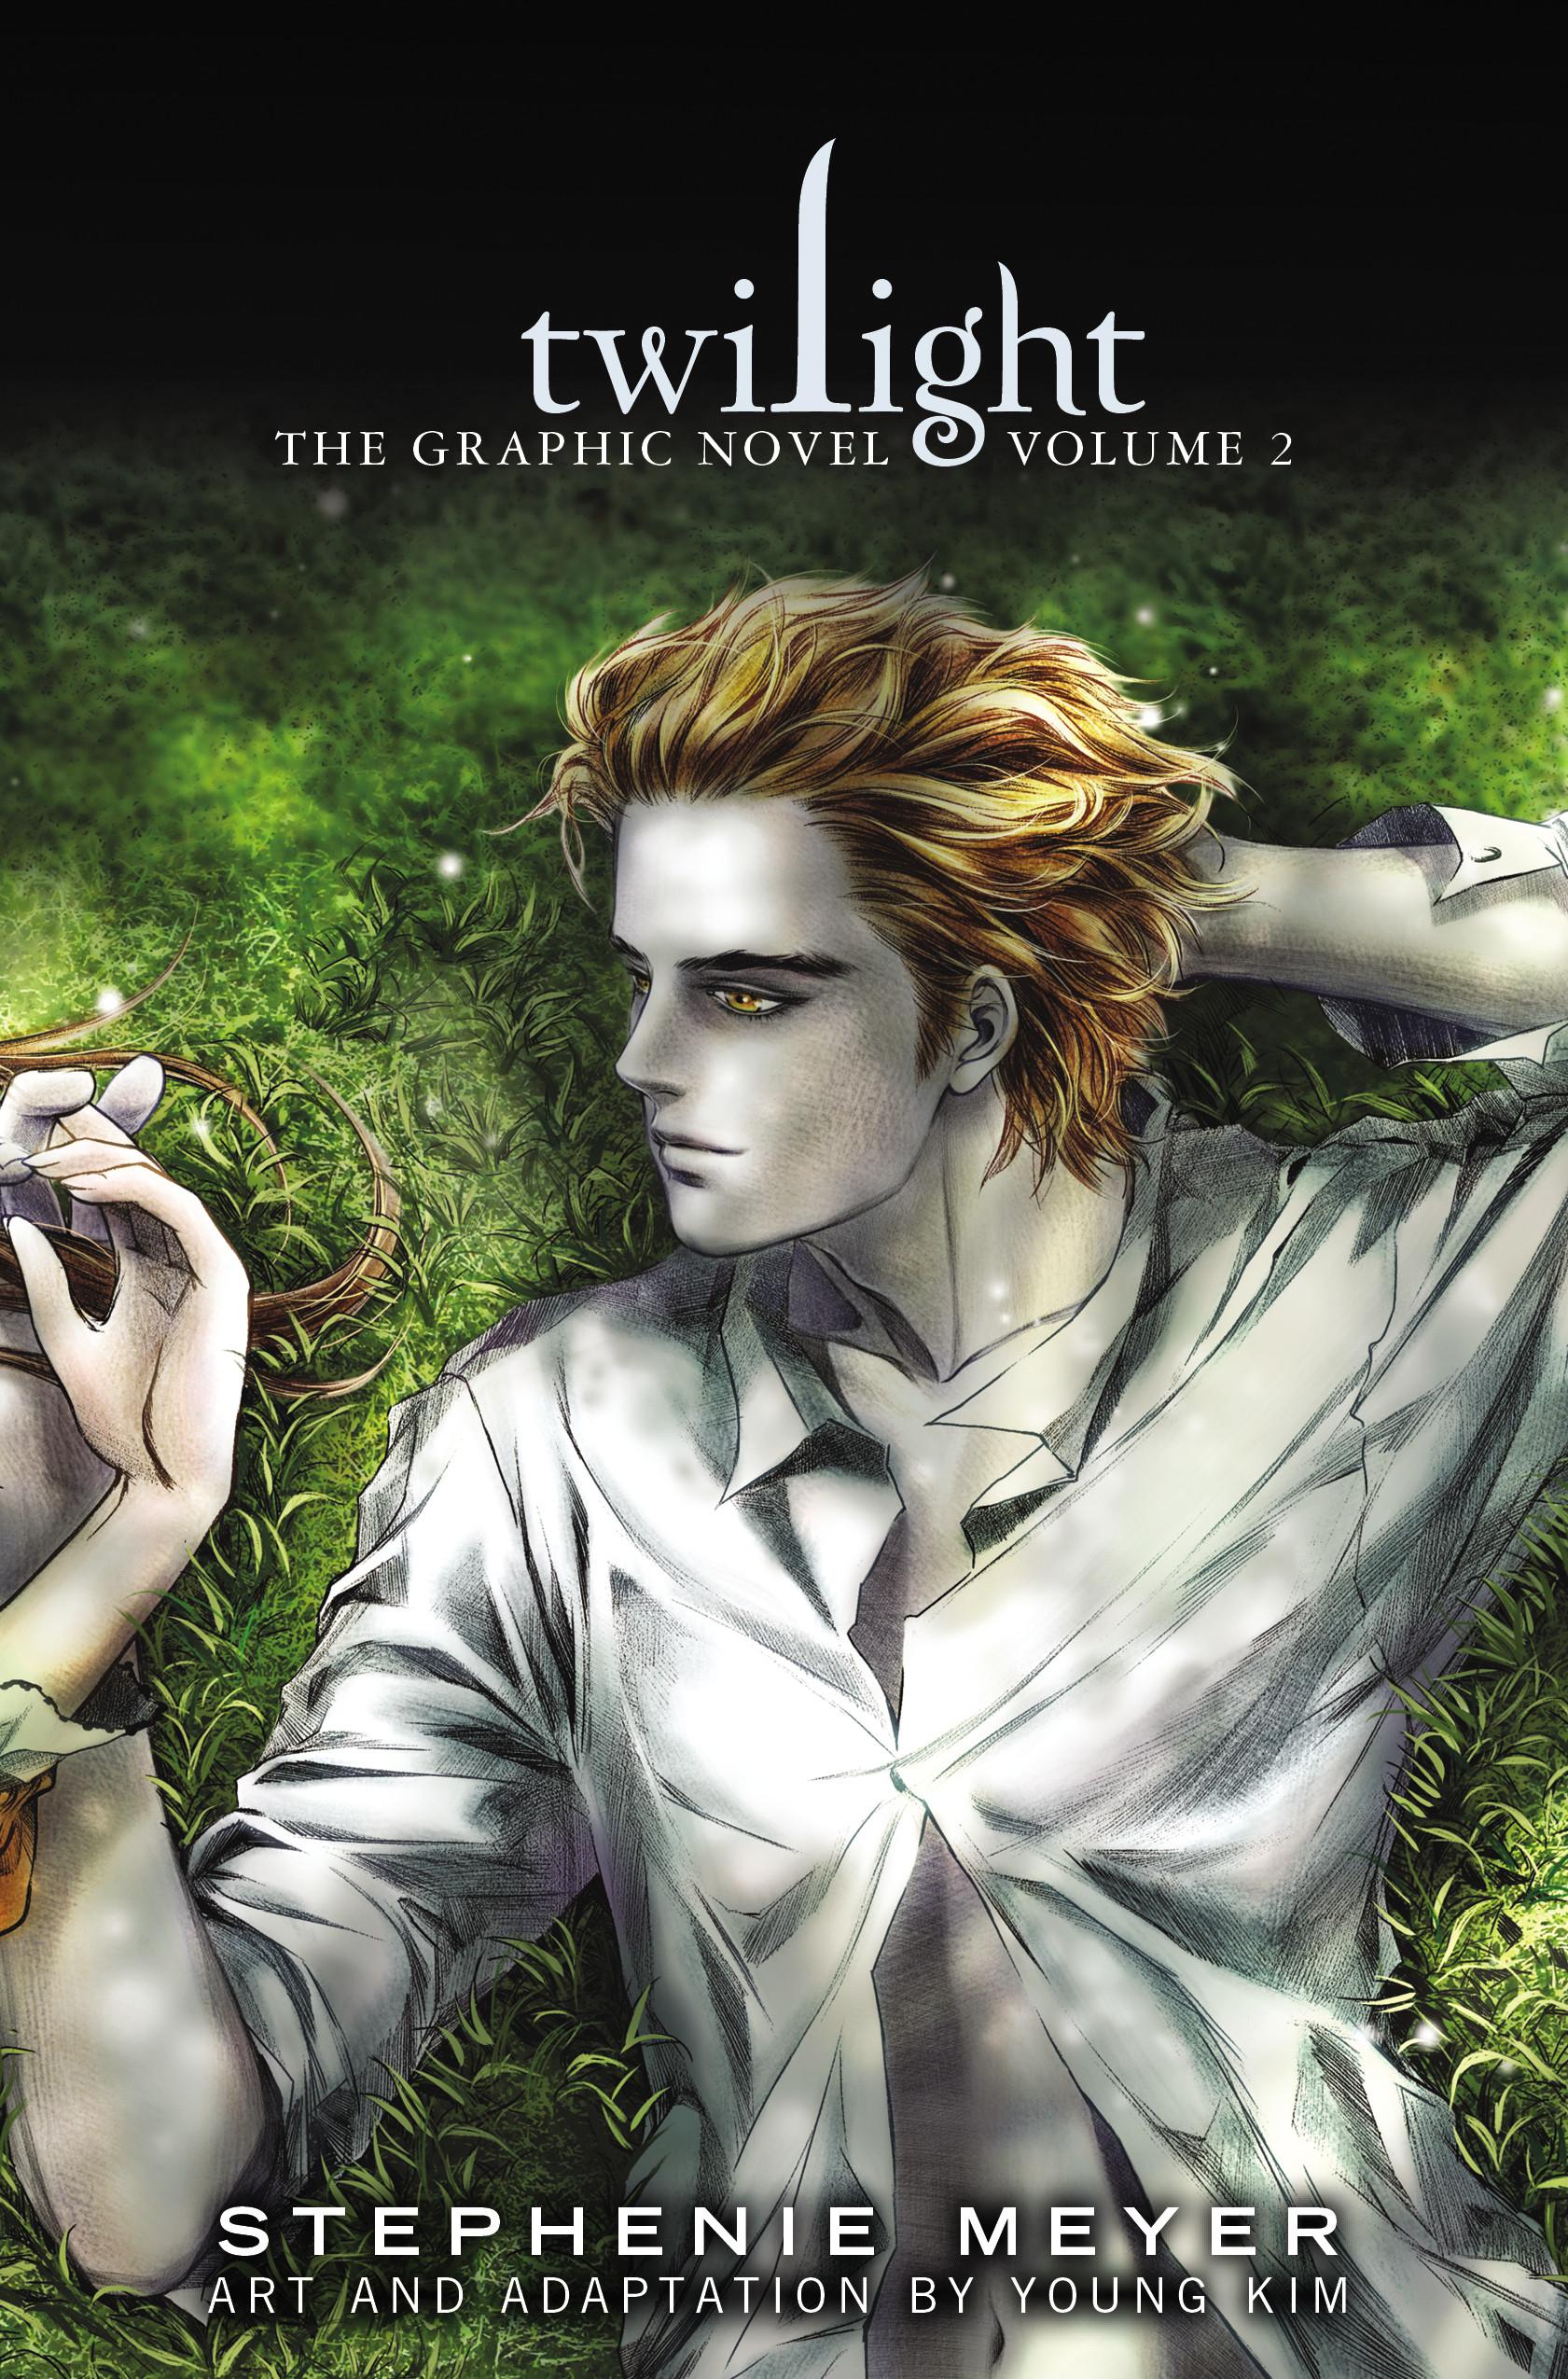 the fan fiction of twilight a novel series by stephanie meyers